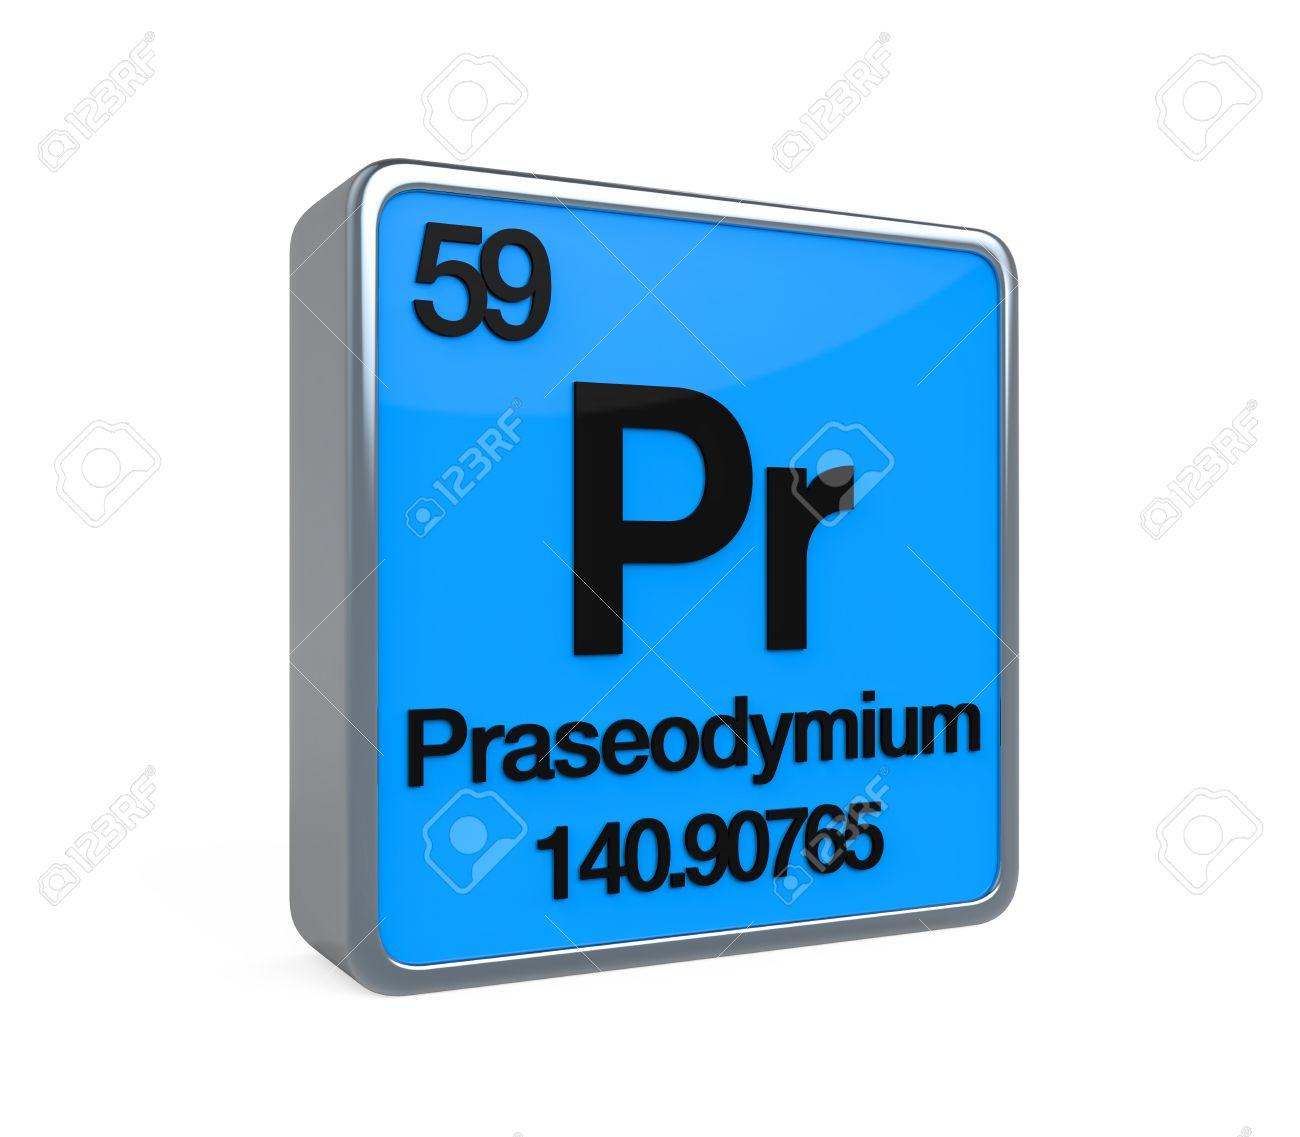 Praseodymium element periodic table stock photo picture and praseodymium element periodic table stock photo 32904212 gamestrikefo Gallery